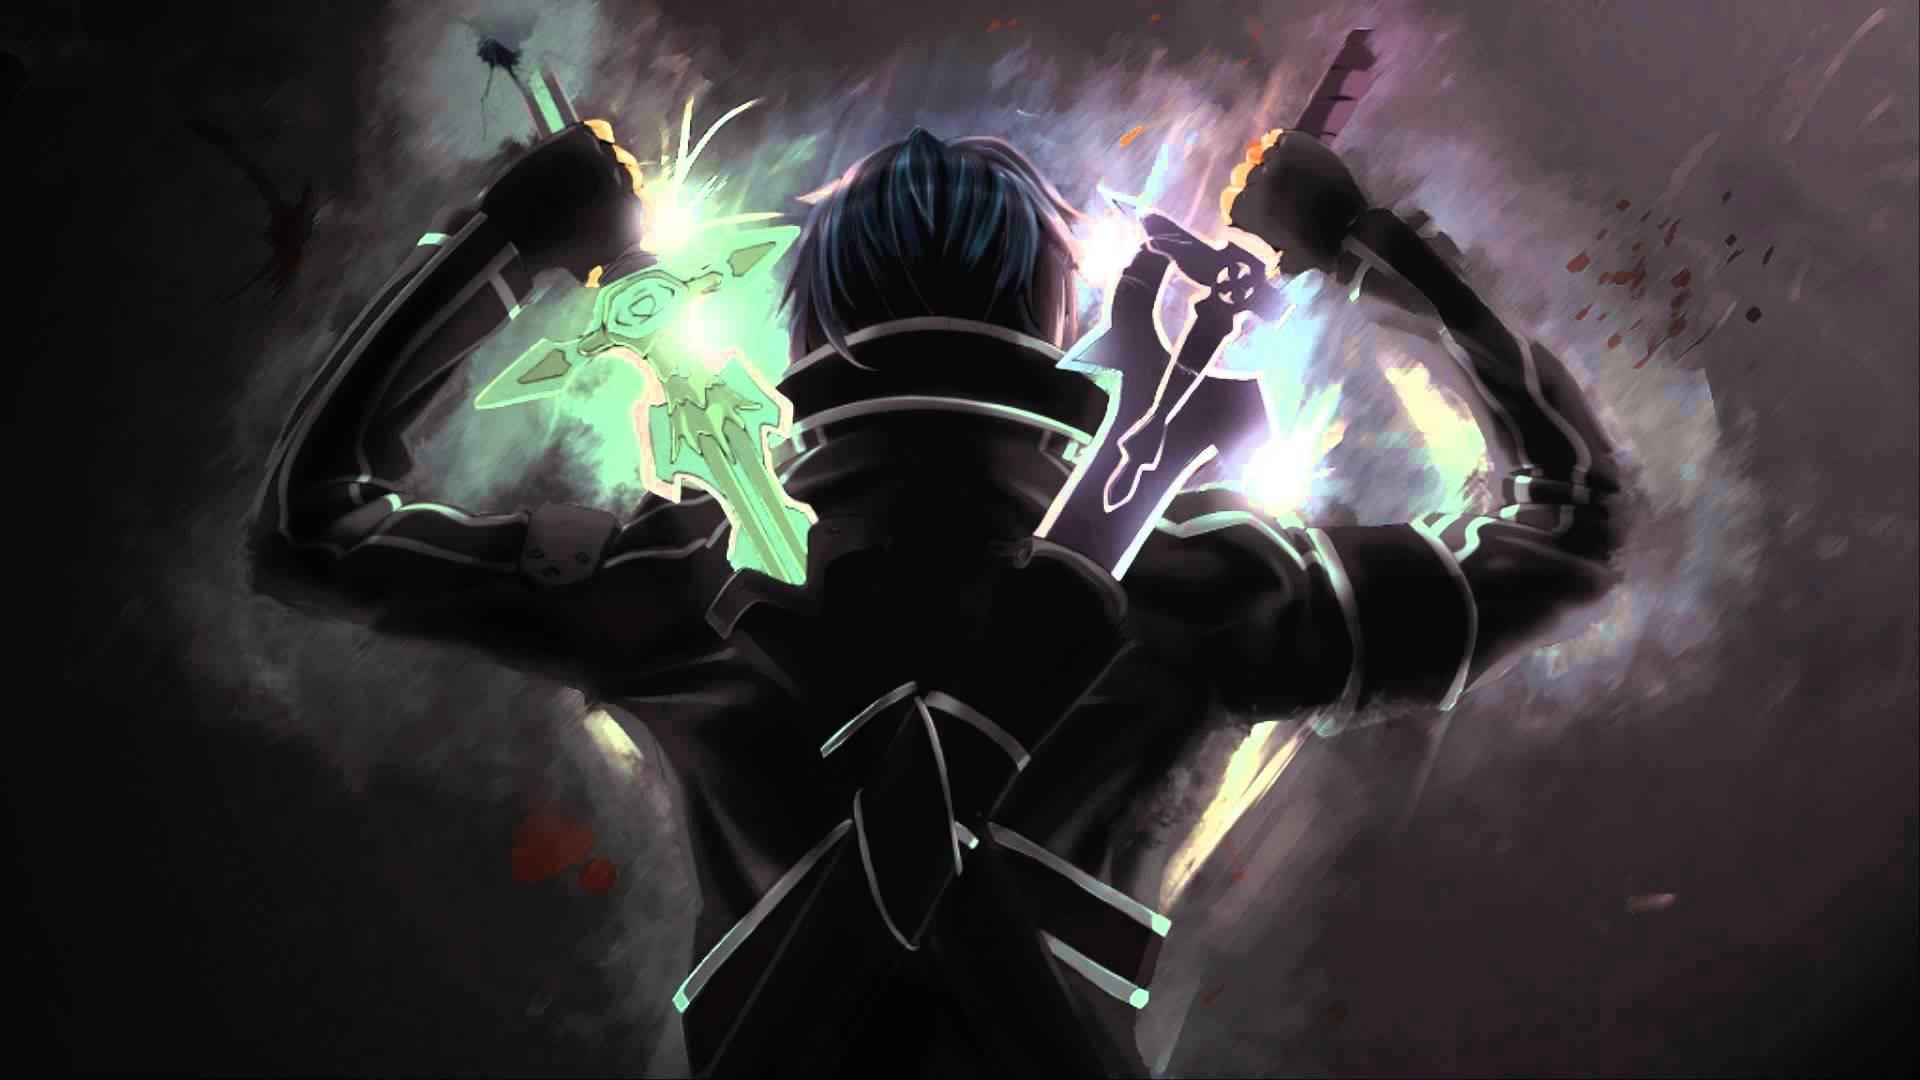 SWORD ART ONLINE II animation fighting sci-fi japanese anime 1saoll fantasy  warrior wallpaper | | 626102 | WallpaperUP